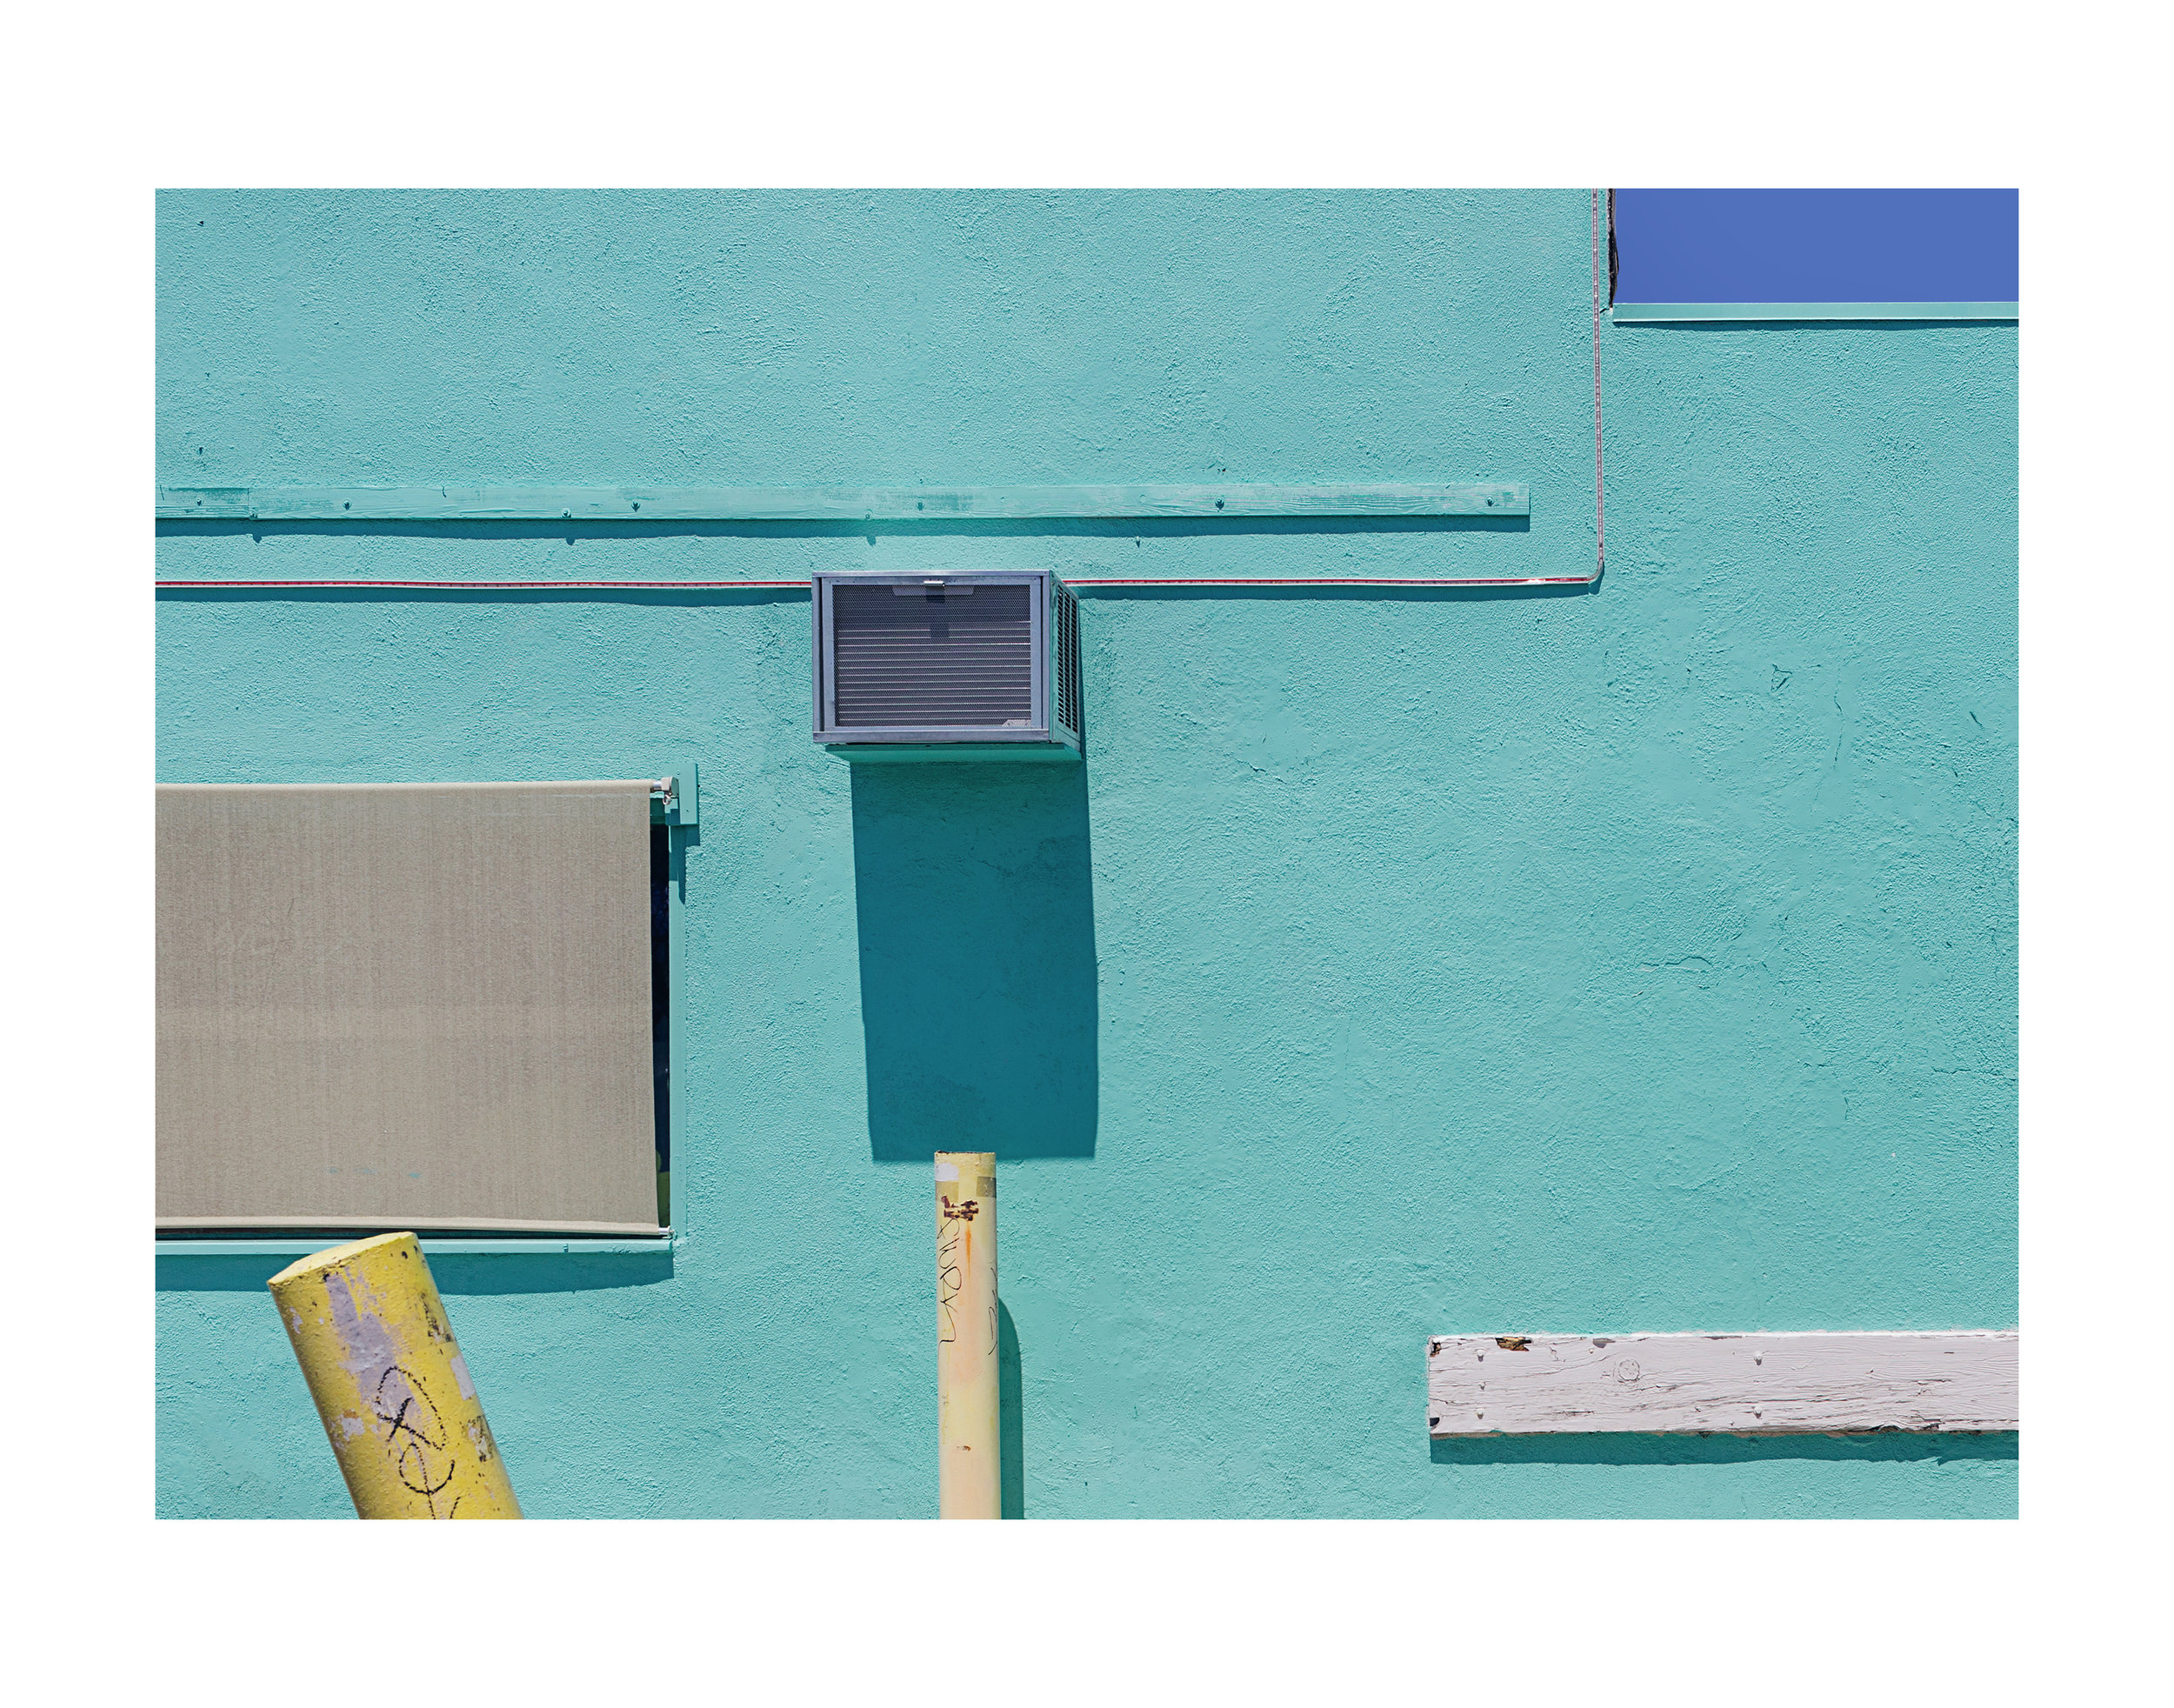 Deconstructed Sidewall; Anaheim, CA 2016